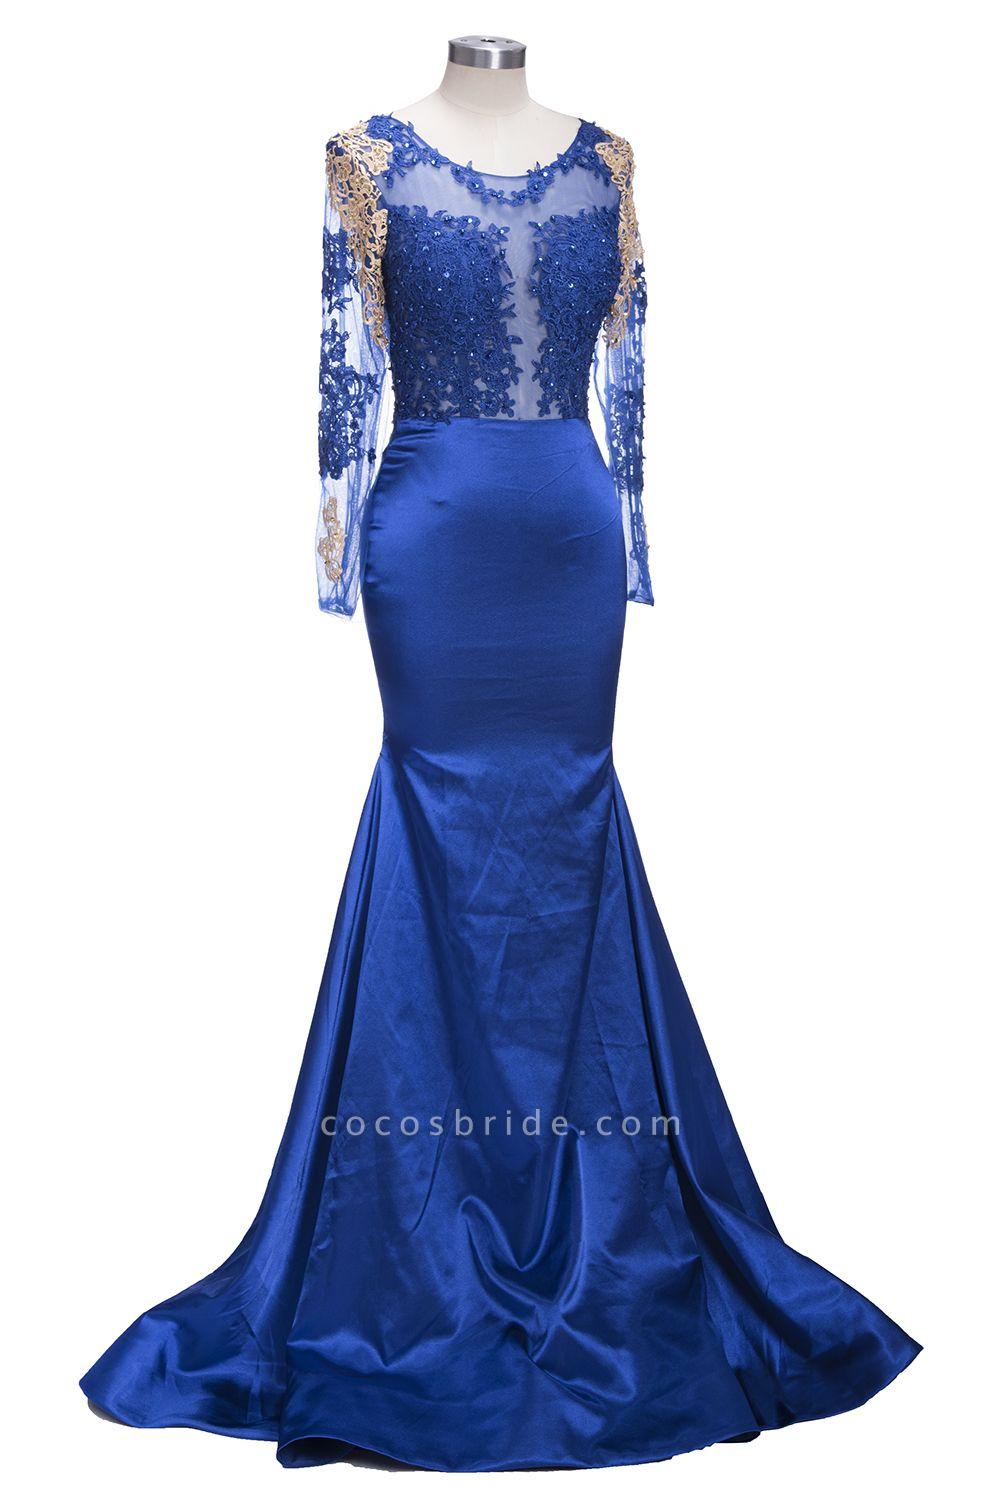 SARAH | Mermaid Long Sleeves Gold-Appliques Sheer Navy Blue Prom Dresses